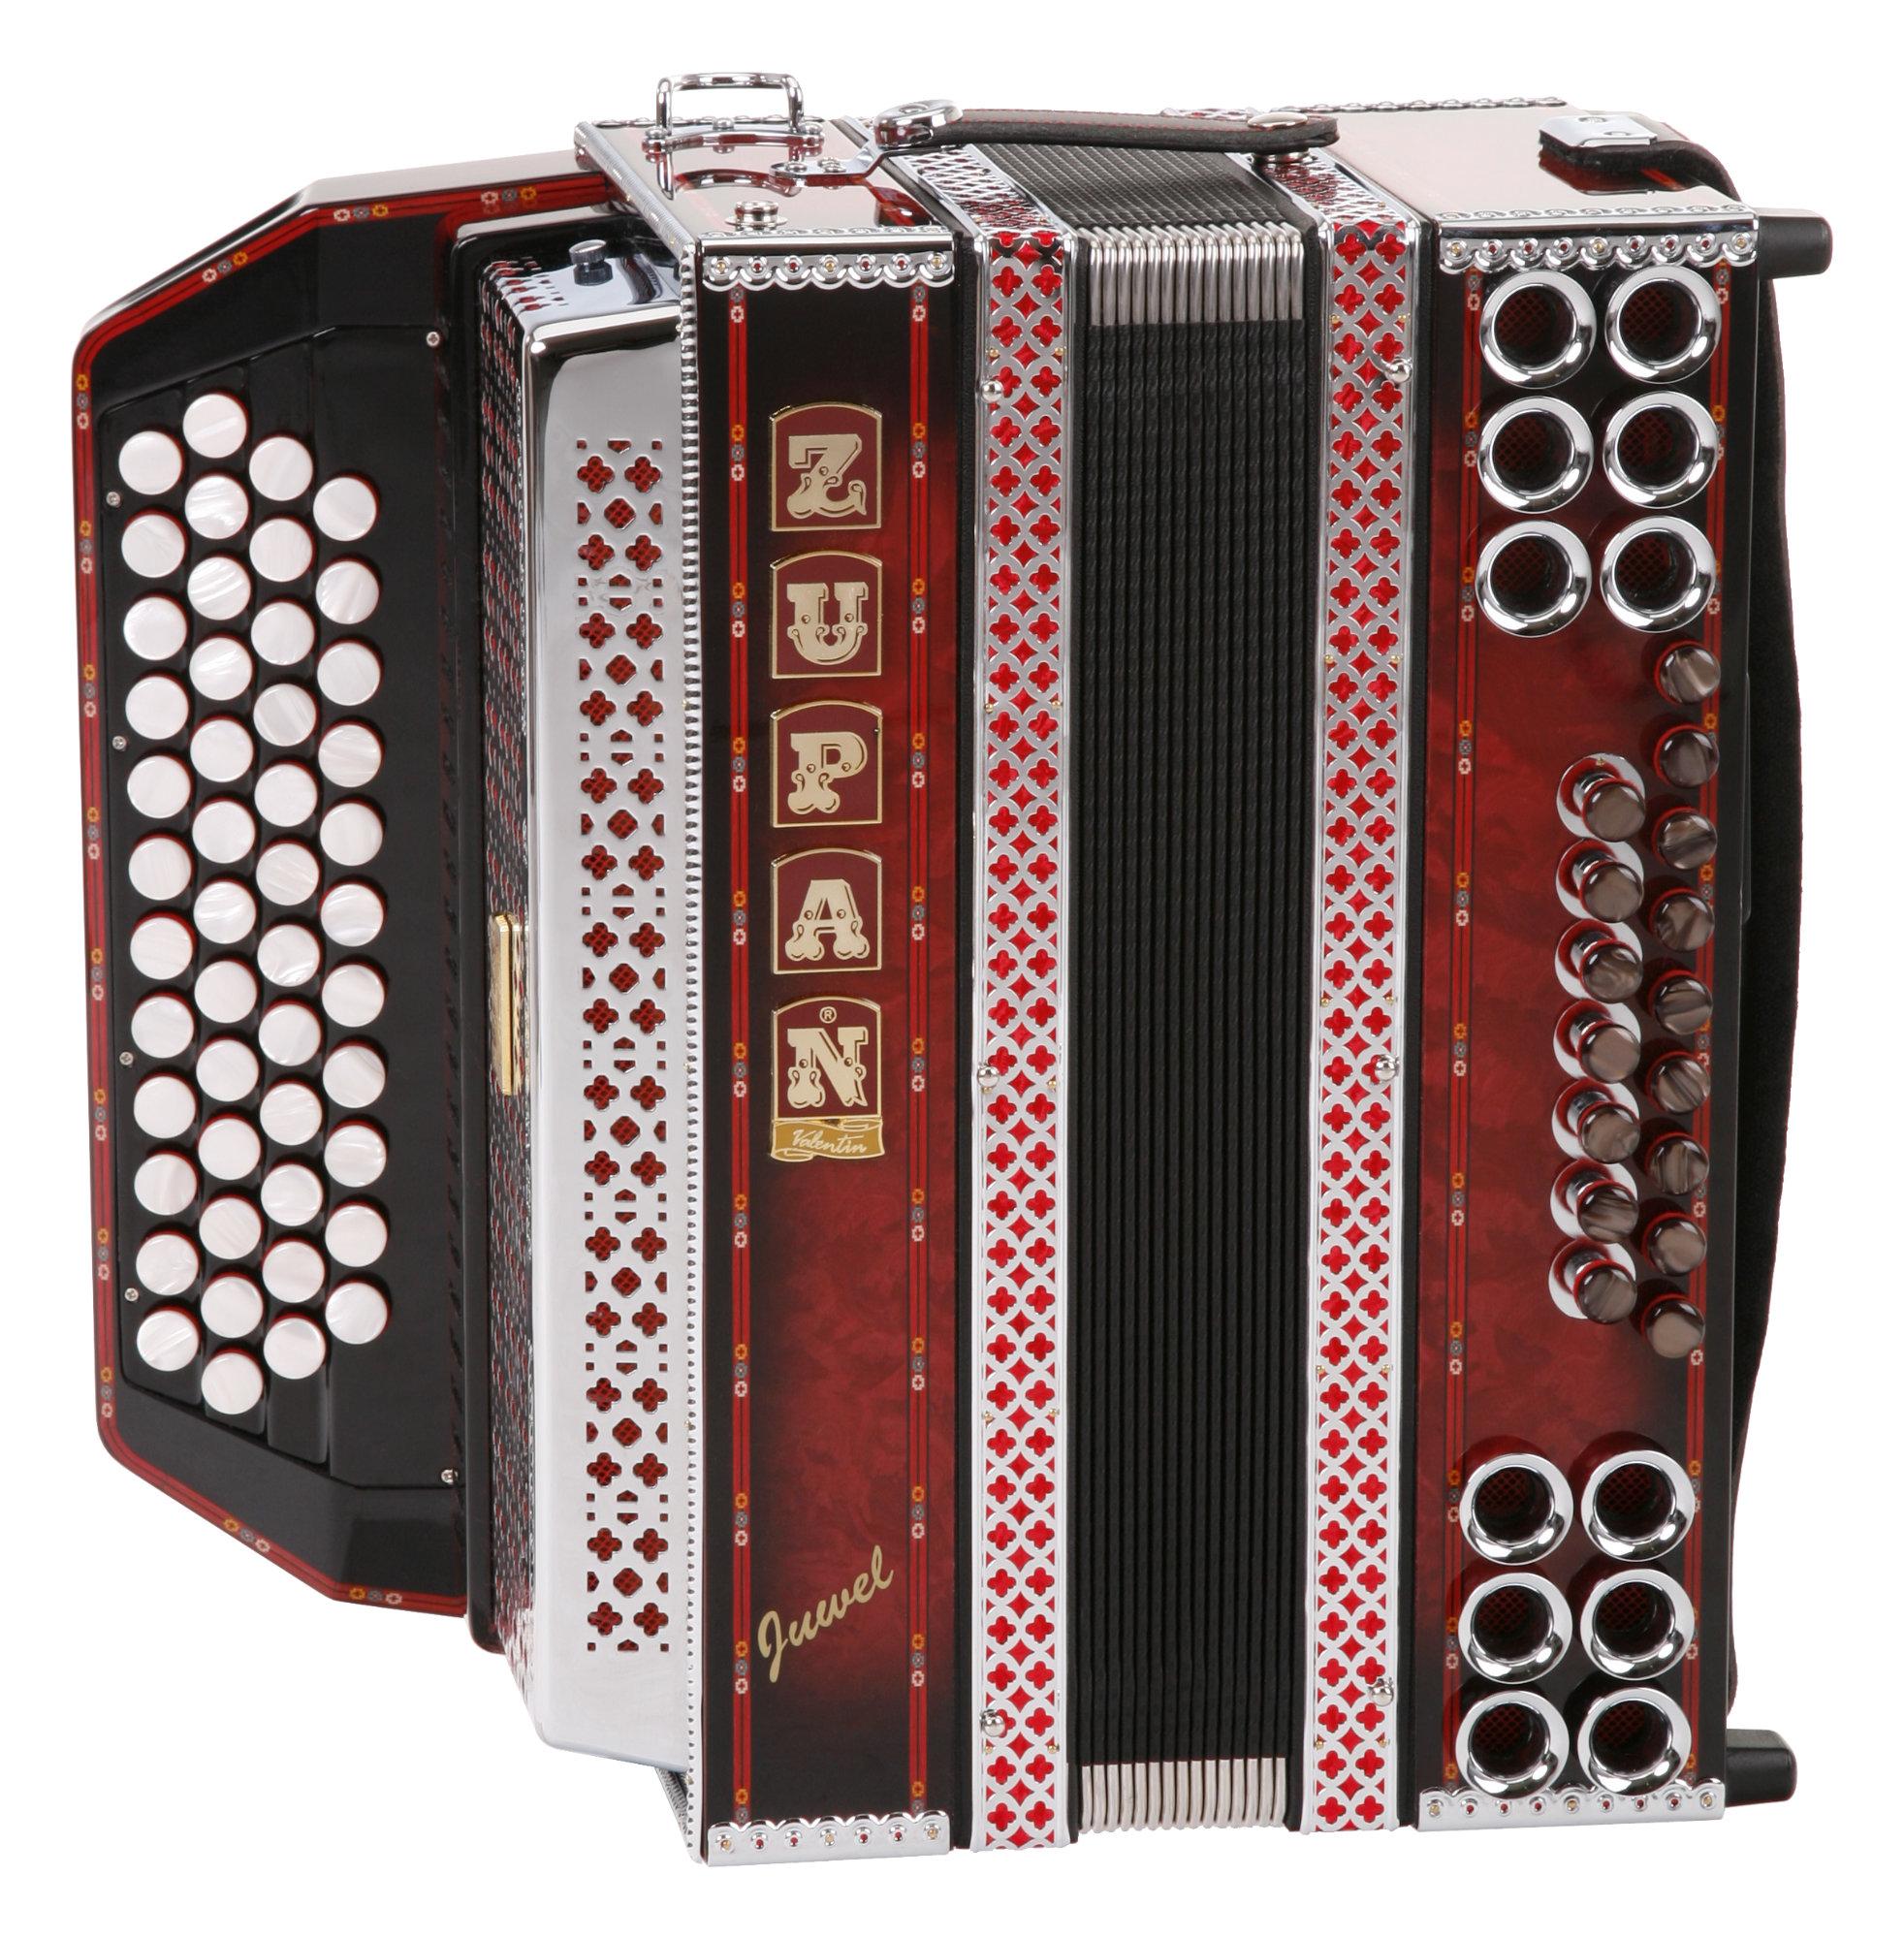 Akkordeons - Zupan Juwel IVD Harmonika Shadow Red G C F Bb Retoure (Zustand wie neu) - Onlineshop Musikhaus Kirstein